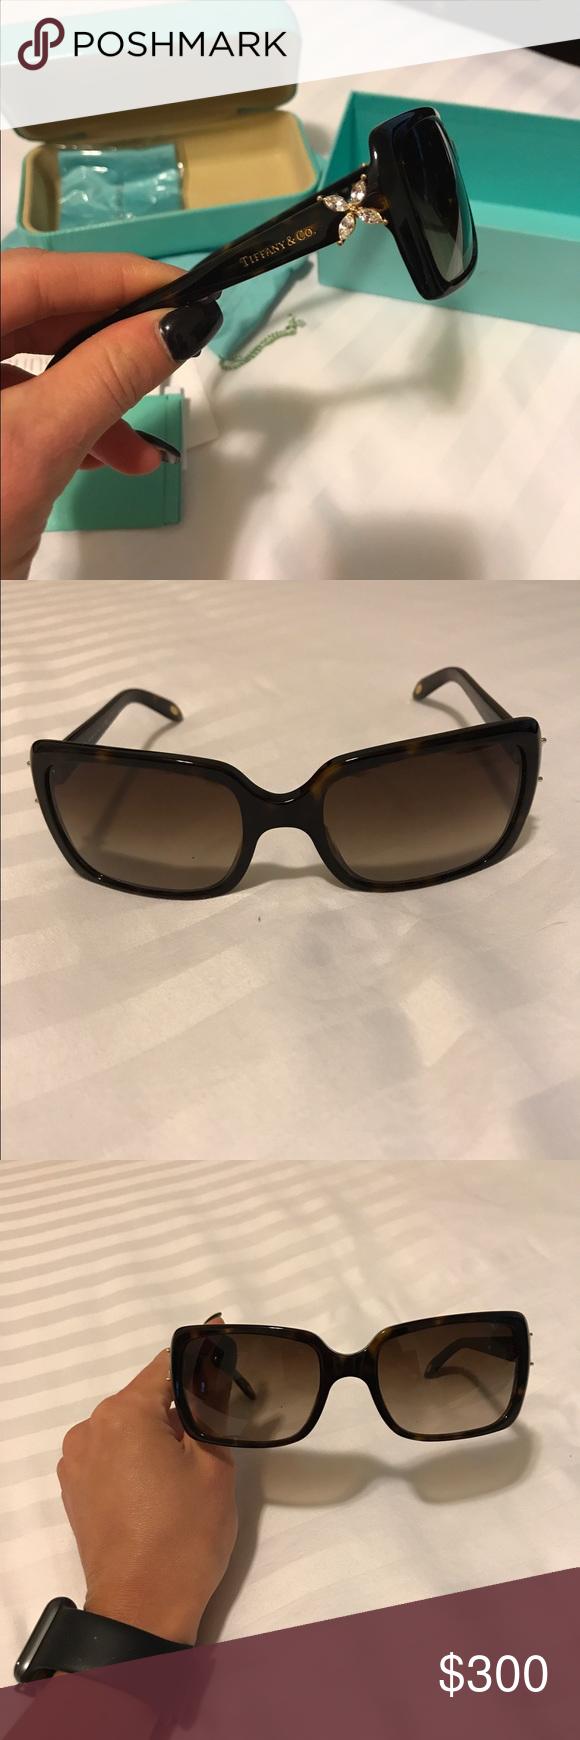 544cf39a72b9 Tiffany Sunglasses with Swarovski Crystals Brand New